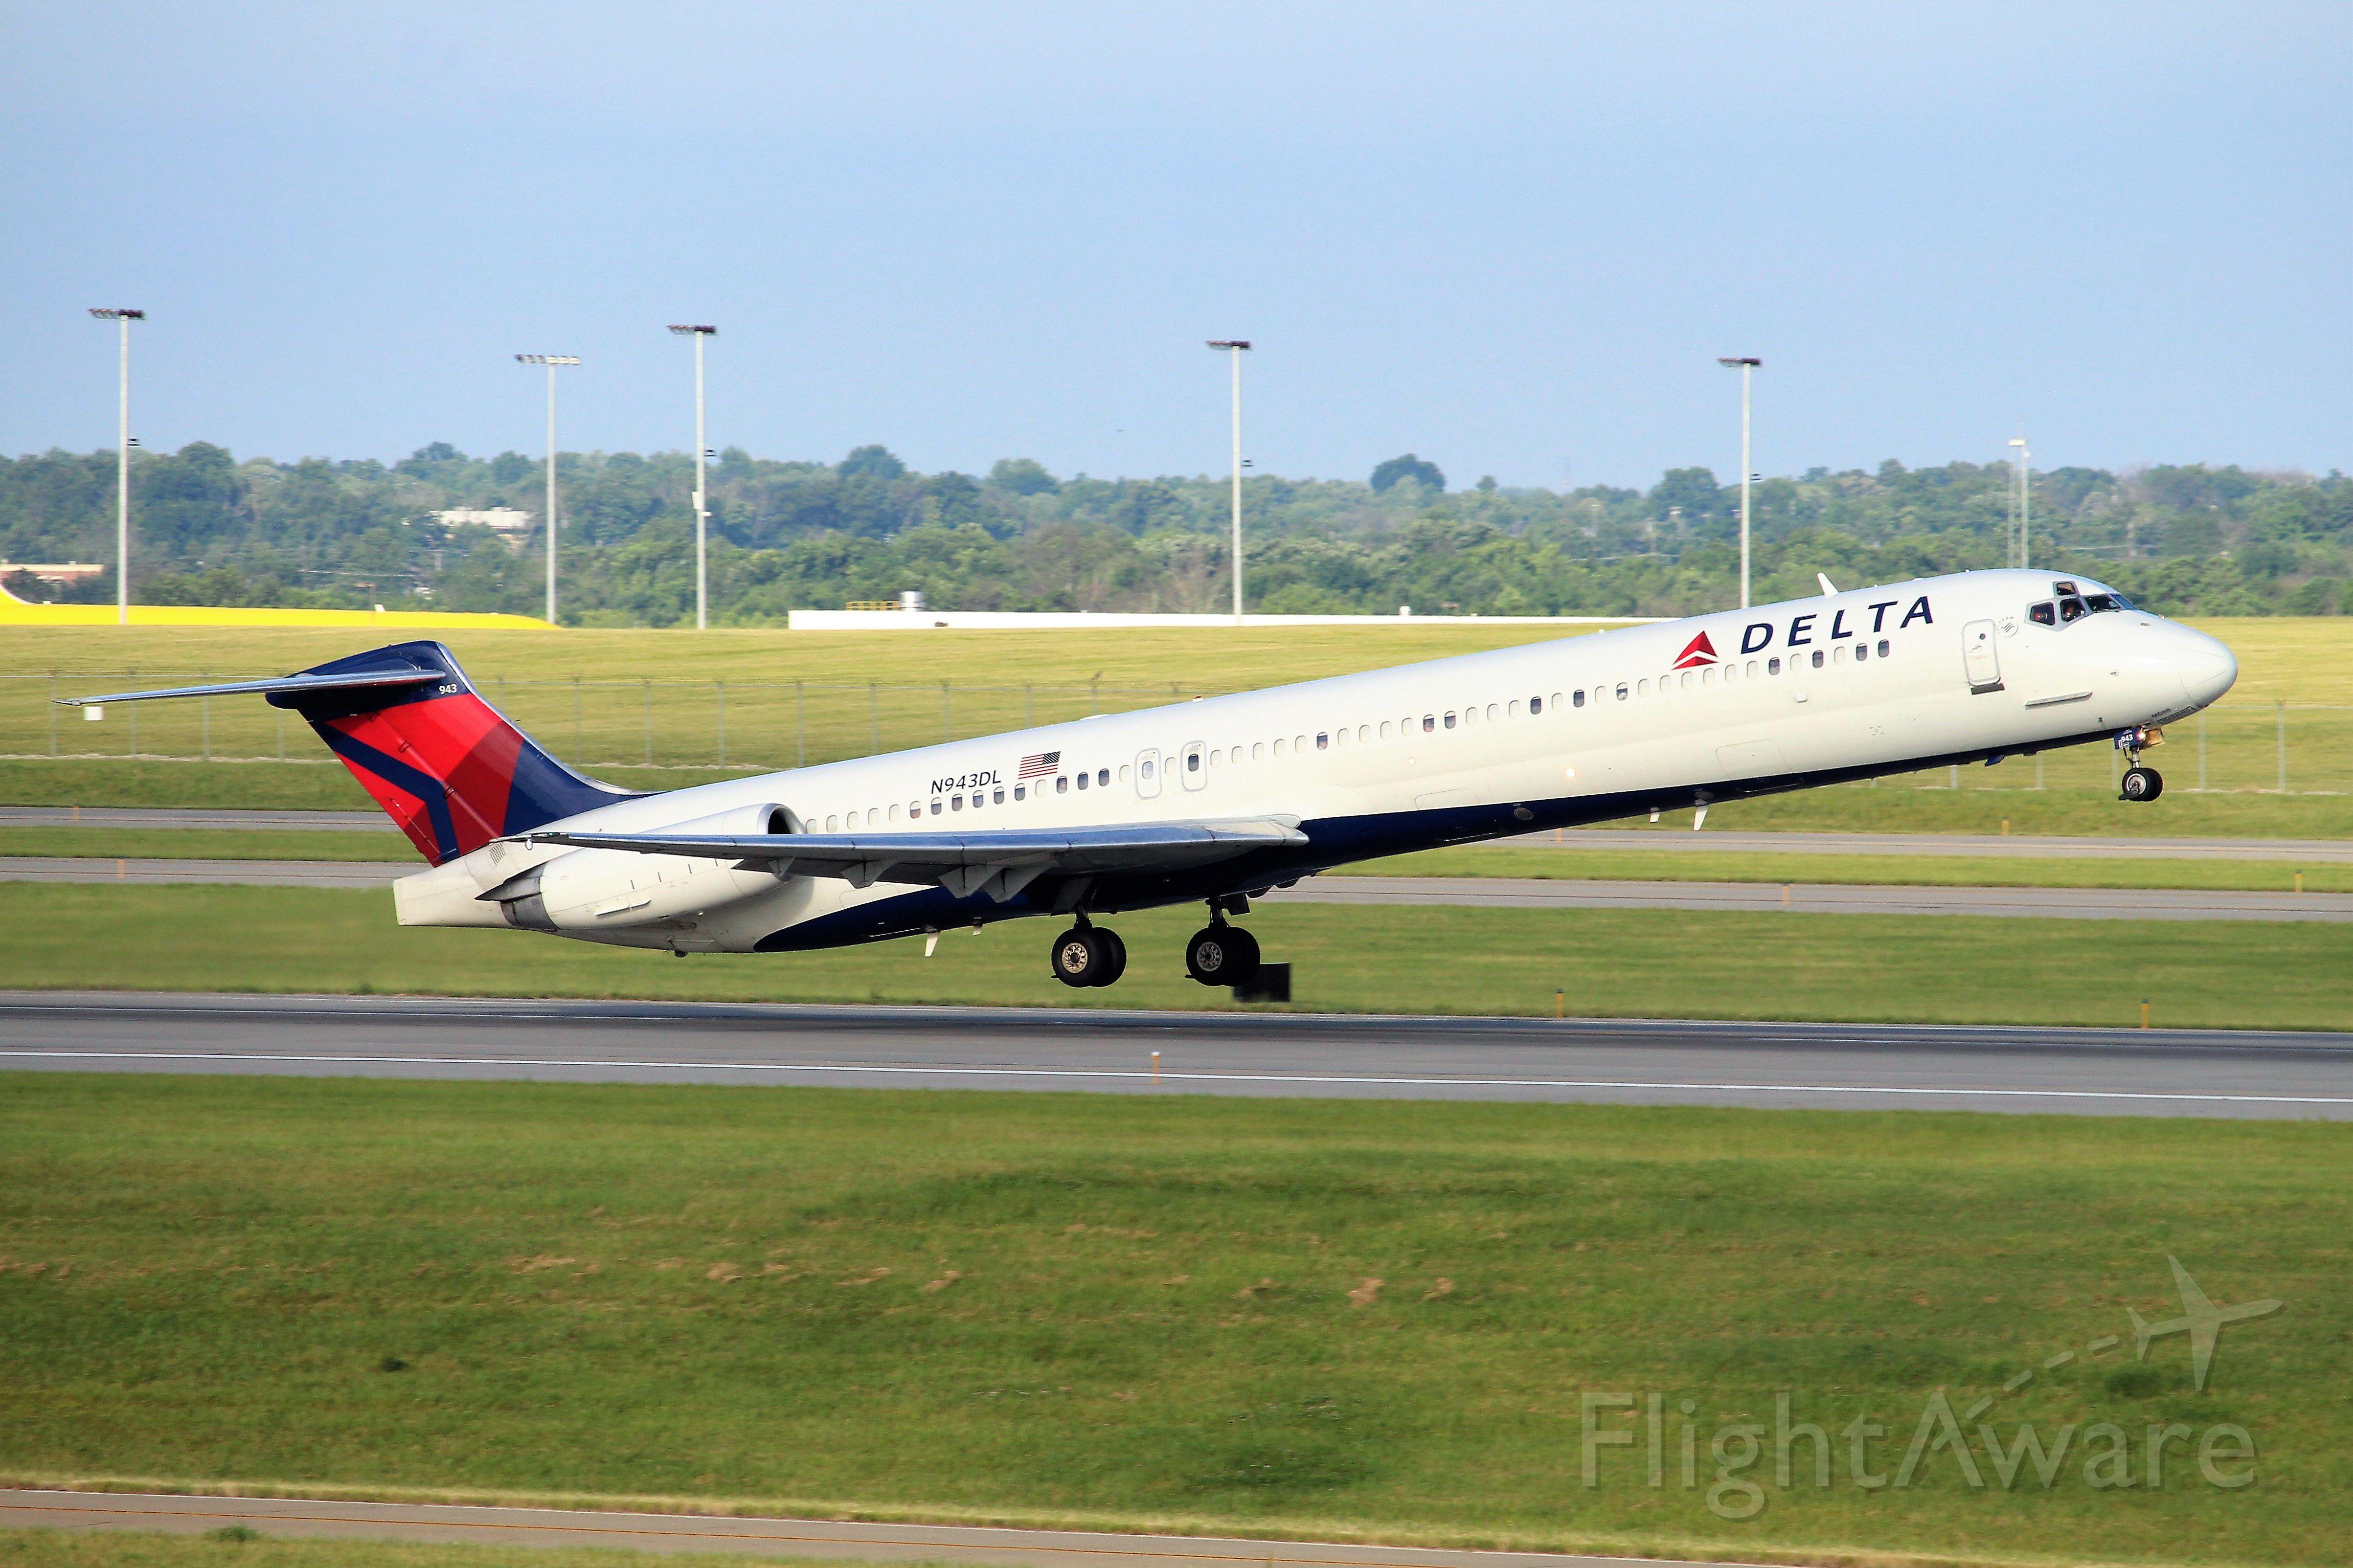 McDonnell Douglas MD-88 (N943DL)